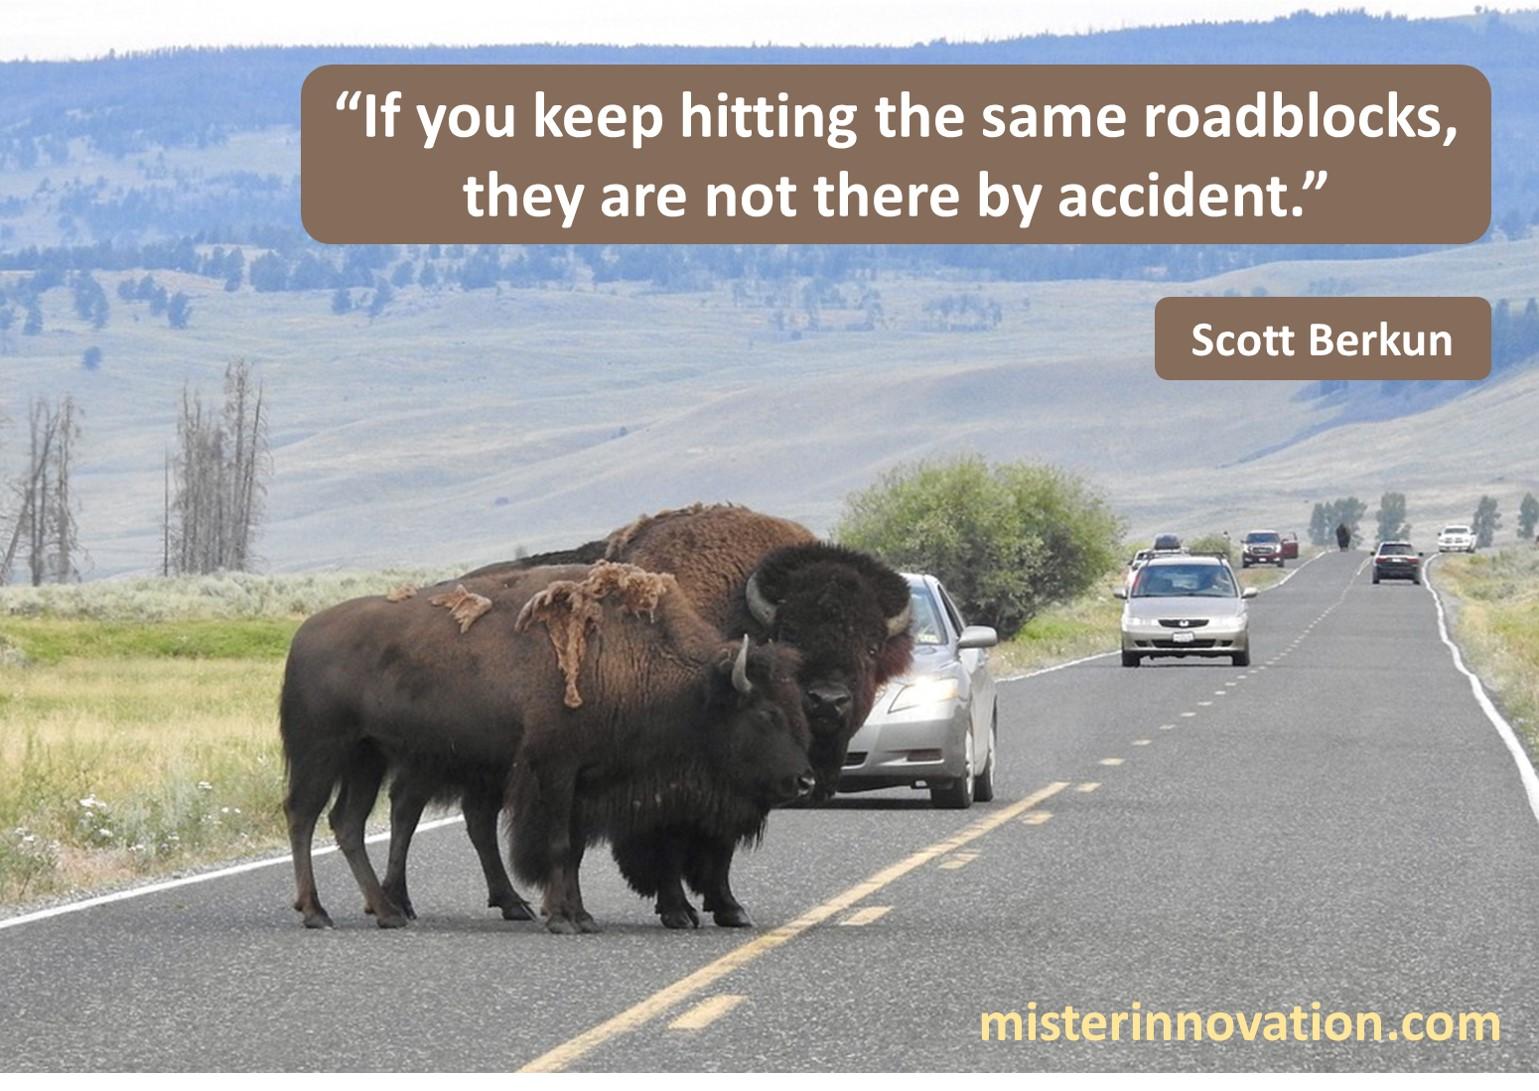 Scott Berkun Roadblocks